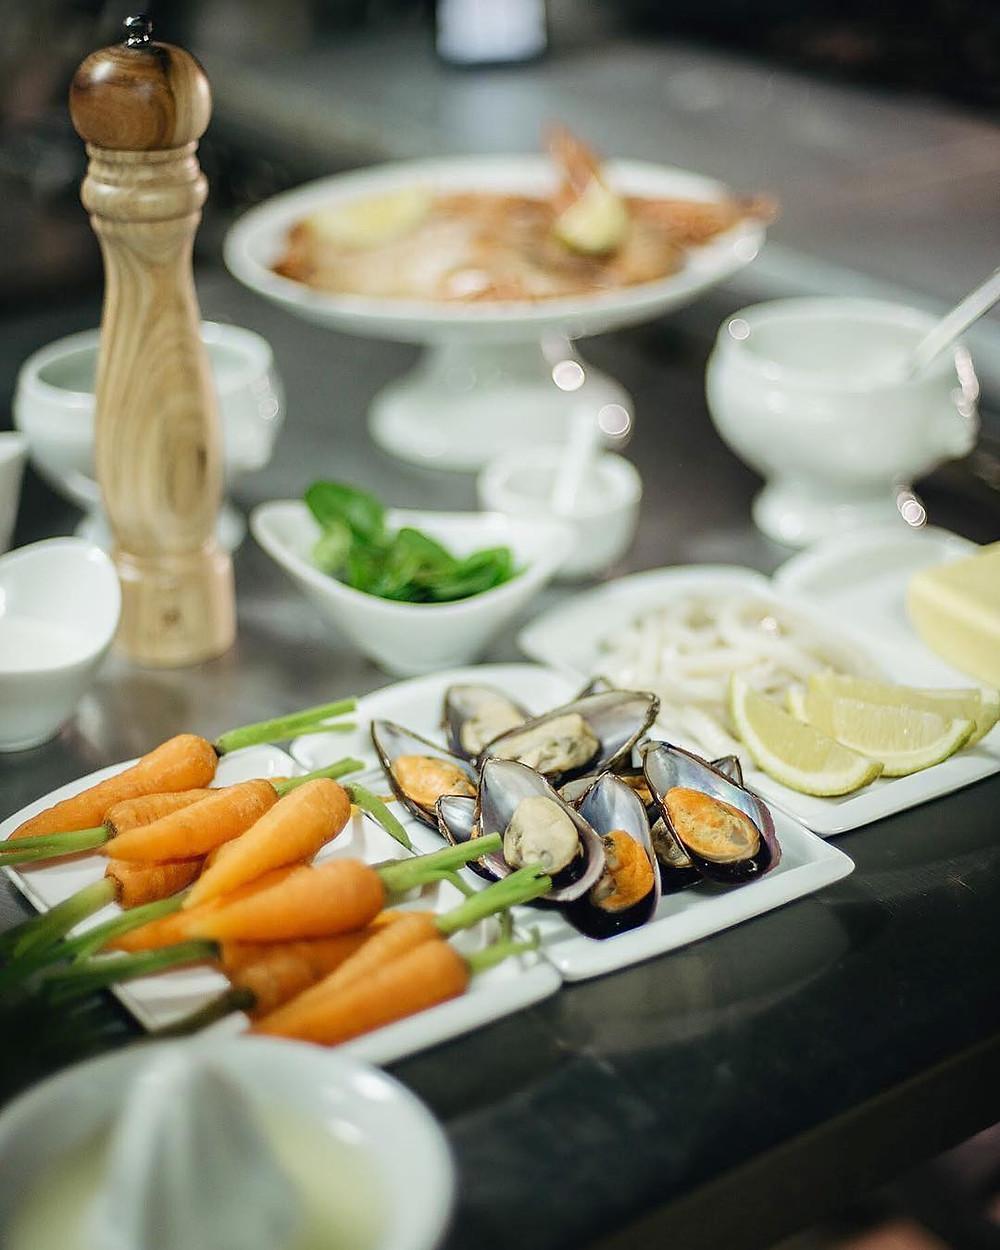 Gastronomia para Eventos, buffet para eventos, buffet para casamentos, buffet para festas, catering, tipo de serviços de jantar, buffet, buffet colonial